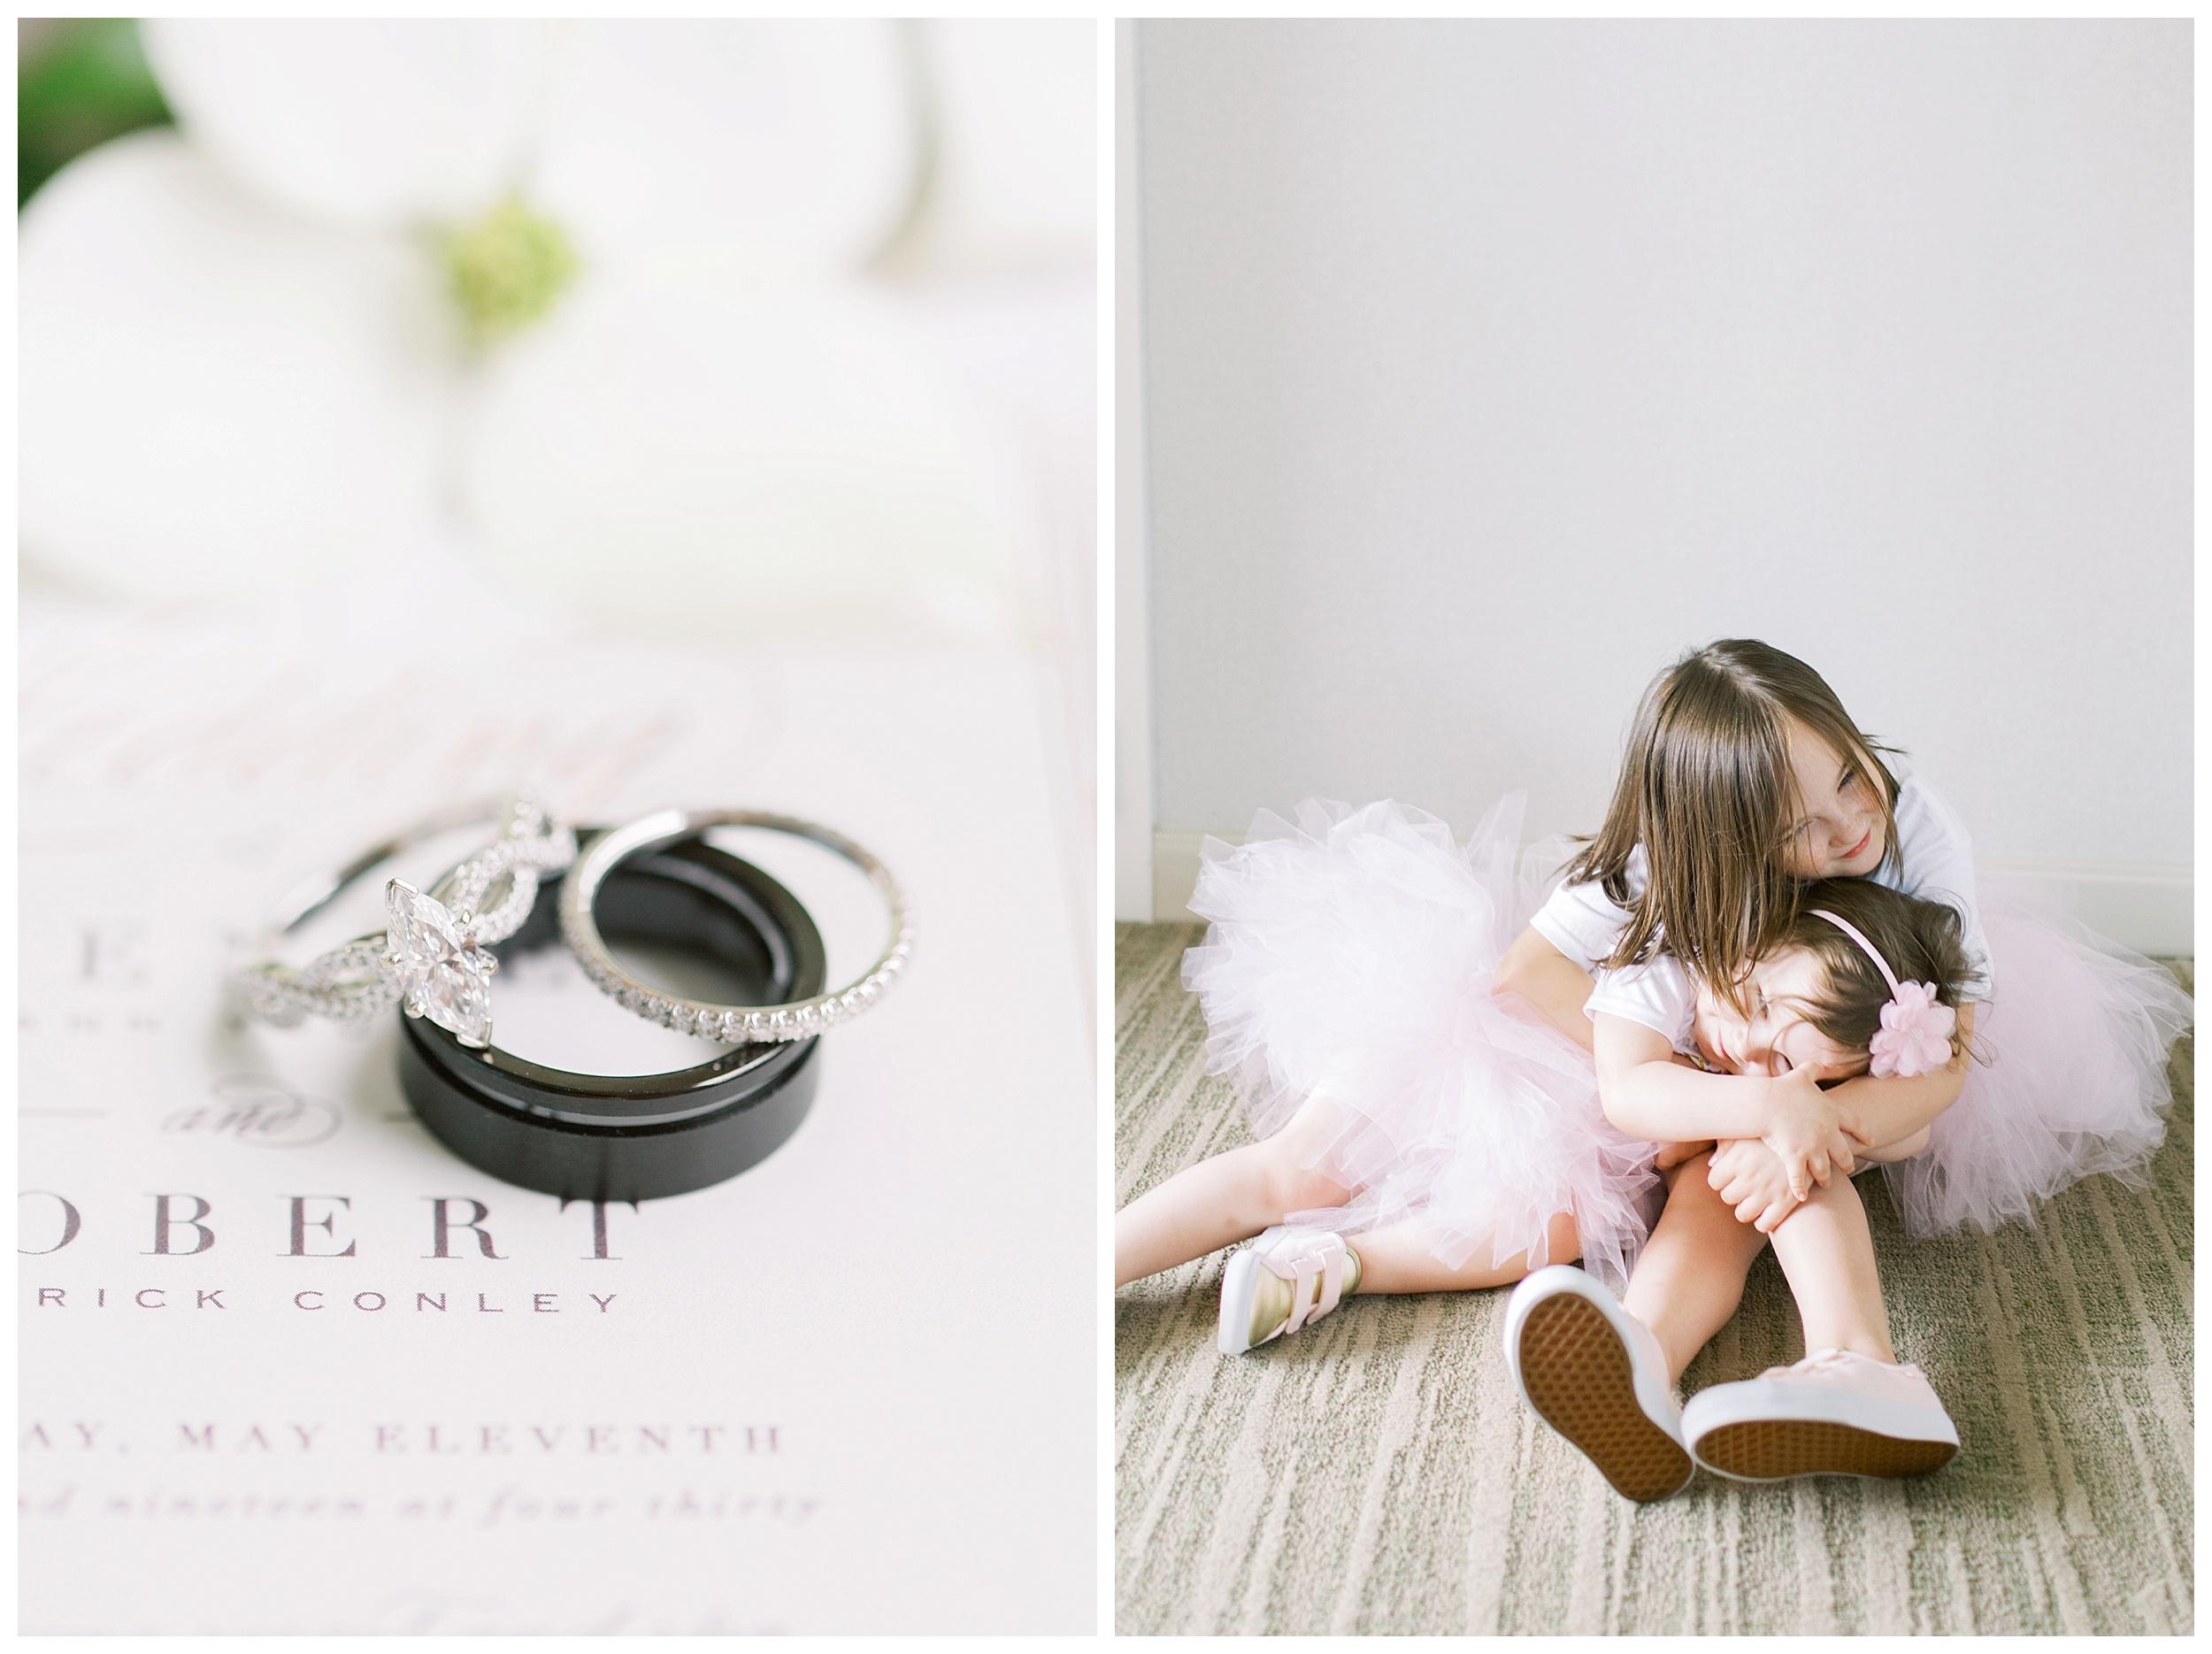 Lansdowne Resort Wedding | Virginia Film Wedding Photographer Kir Tuben_0014.jpg